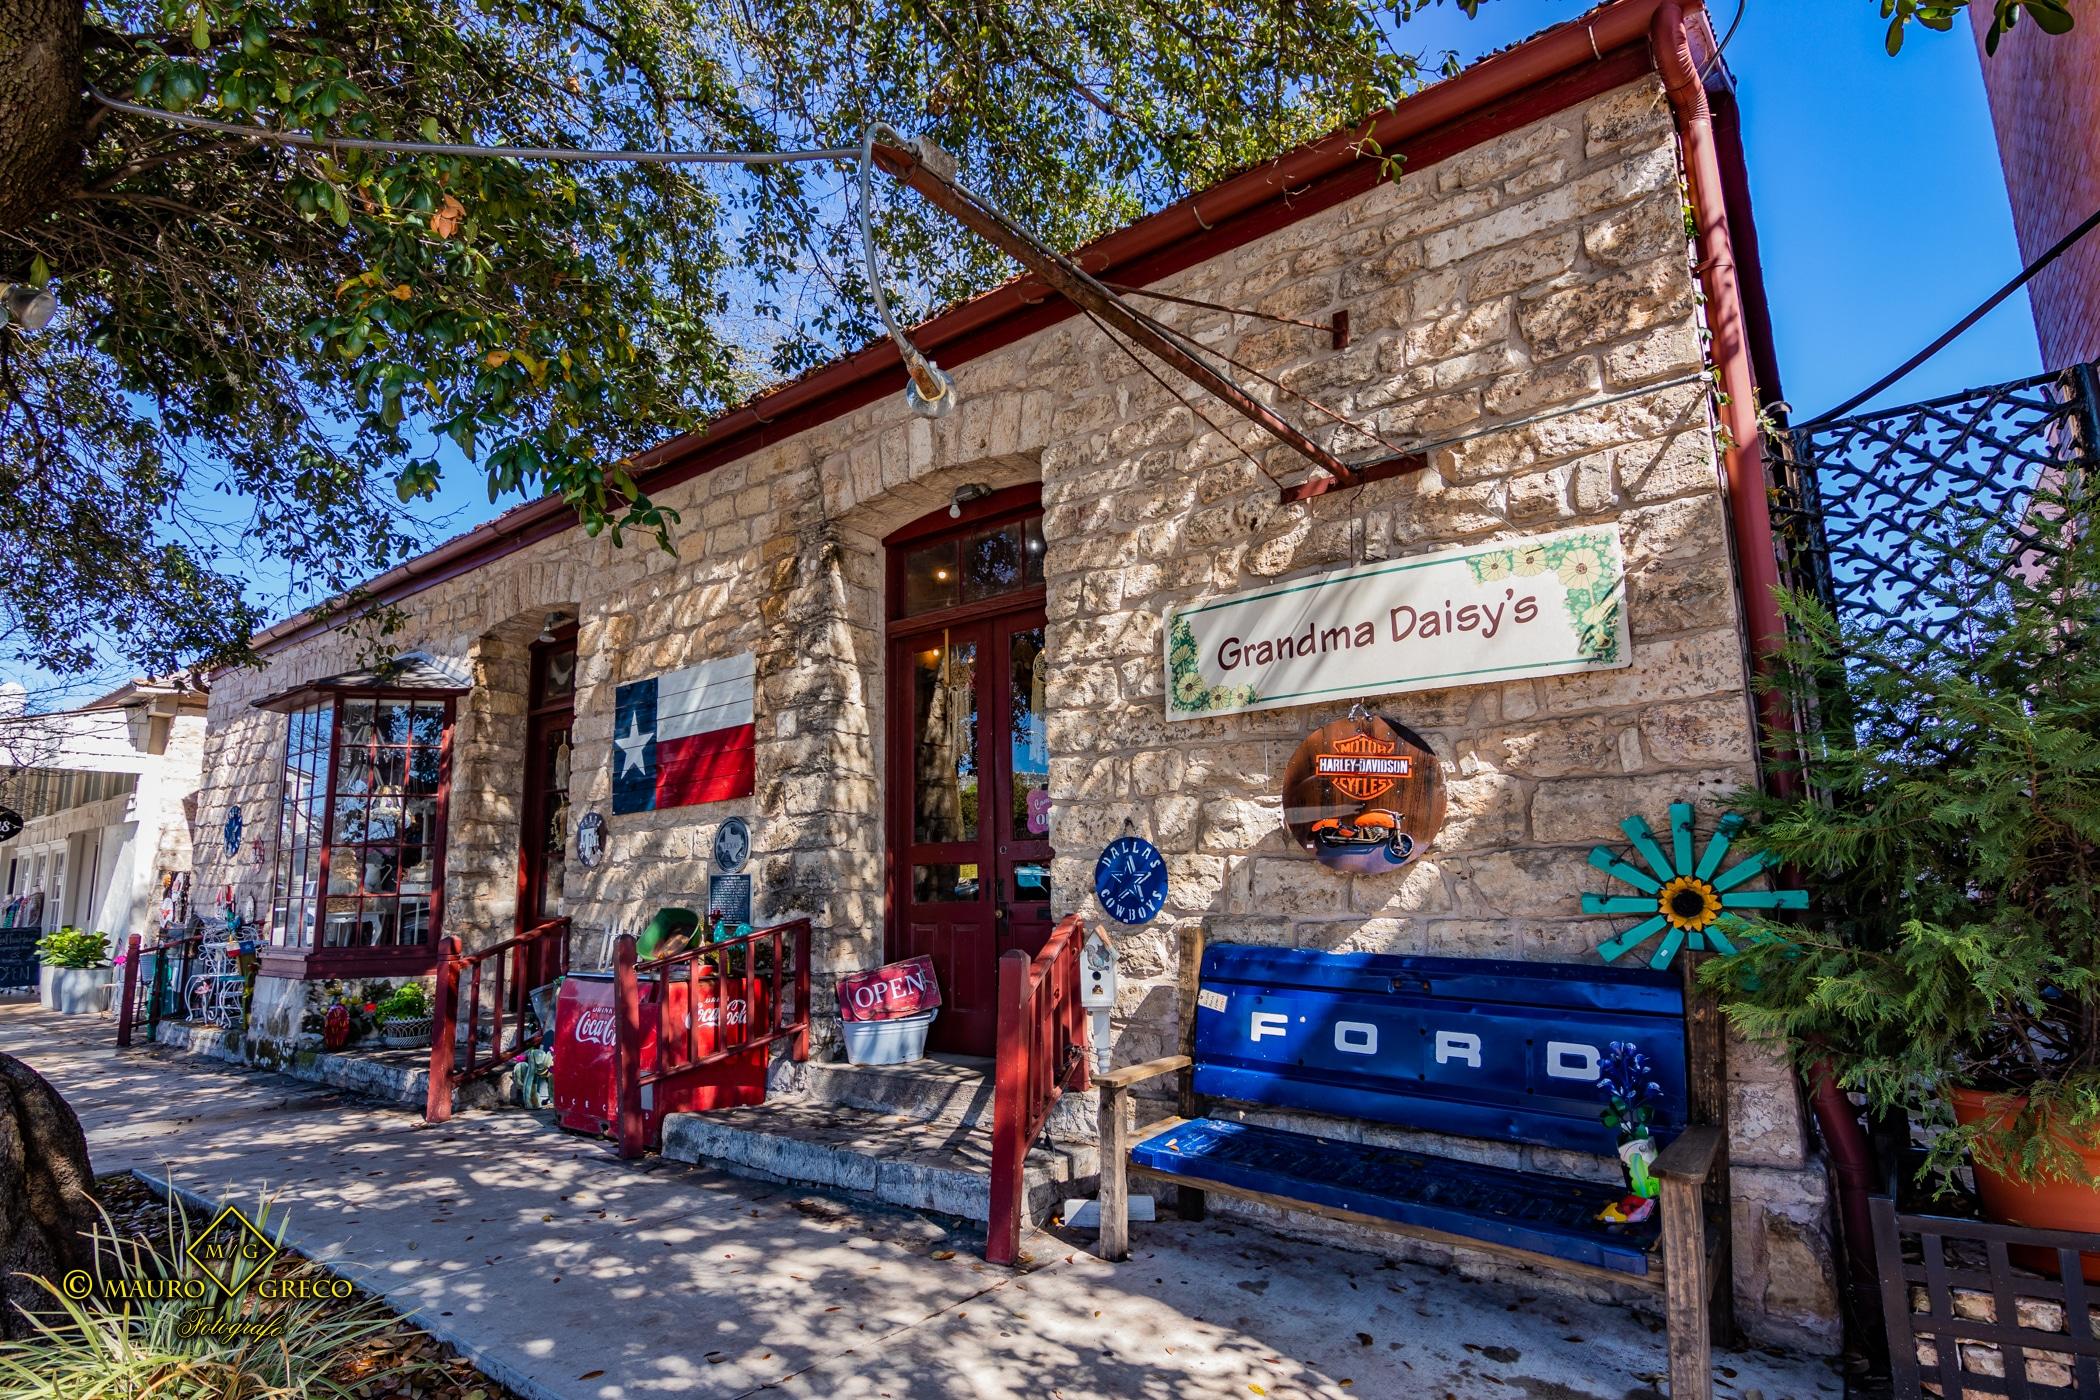 Frederisburg Texas 2020 Tornado Moto Tour Viaggi organizzati in moto negli USA Monument Valley